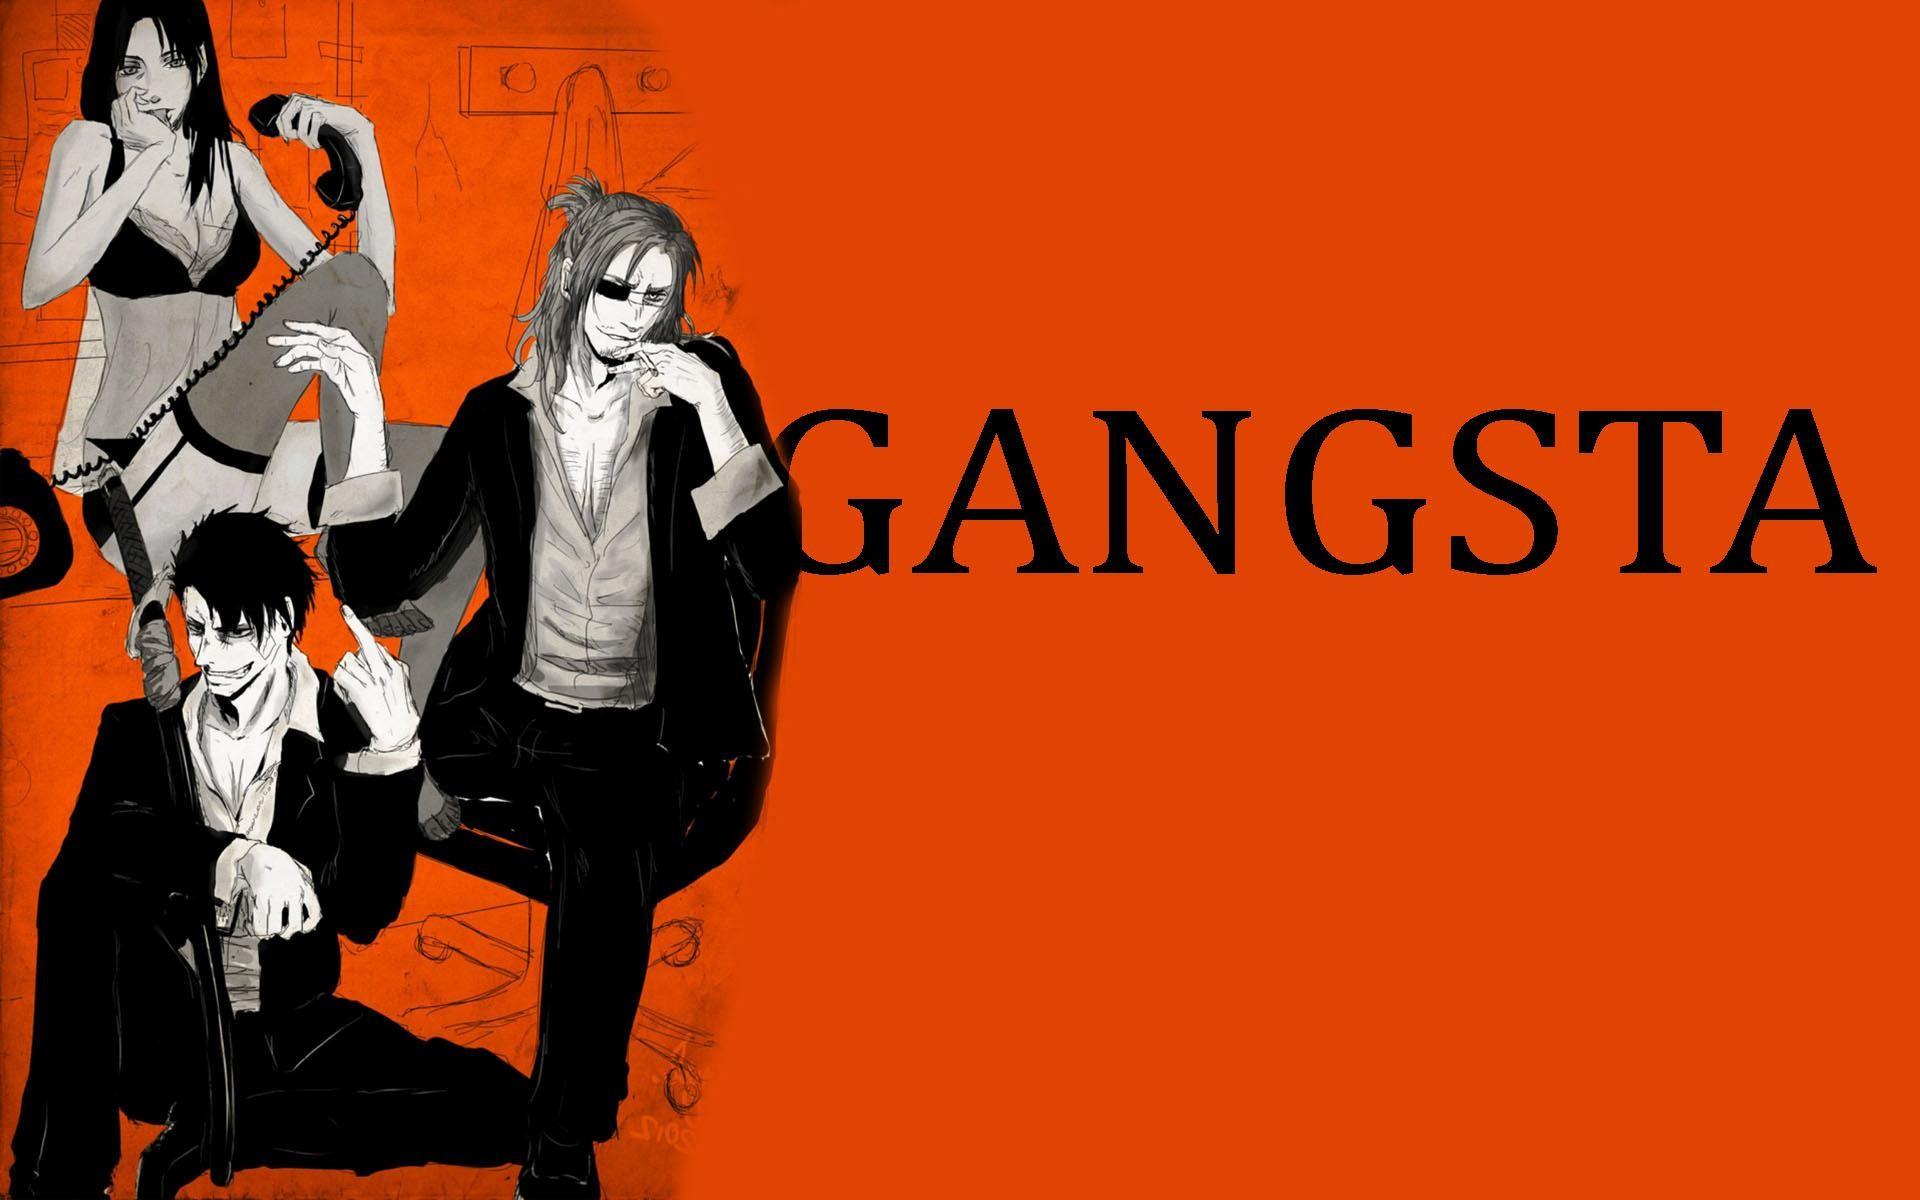 Wiki Hd Gangsta Pictures Pic Wpd004433   Data Src - Gangsta Anime Wallpaper Hd - HD Wallpaper